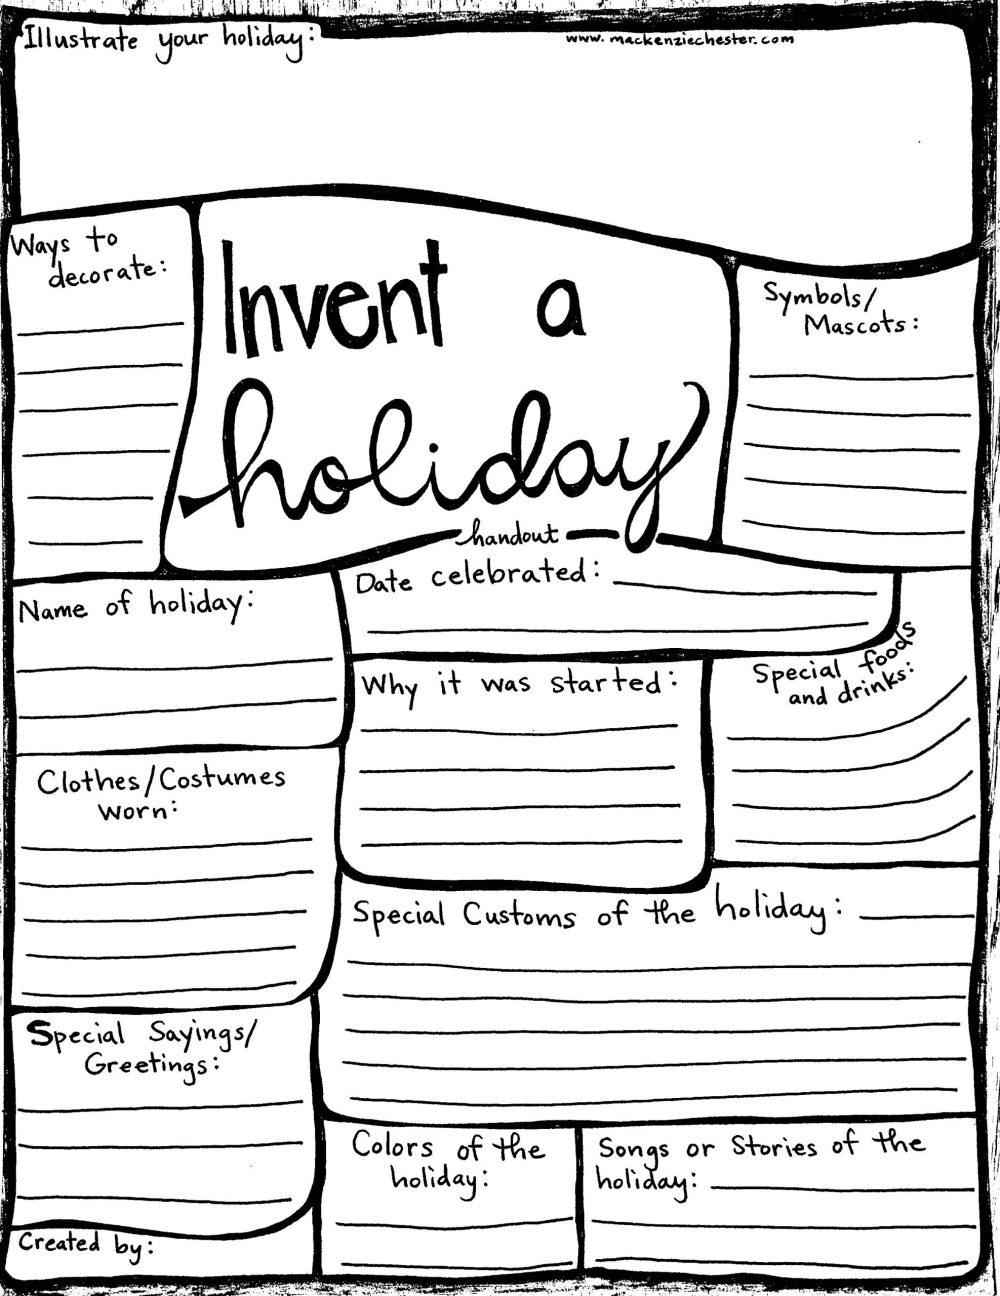 invent a holiday handout free printable creative family idea box sacred everyday creative family culture mackenziechester